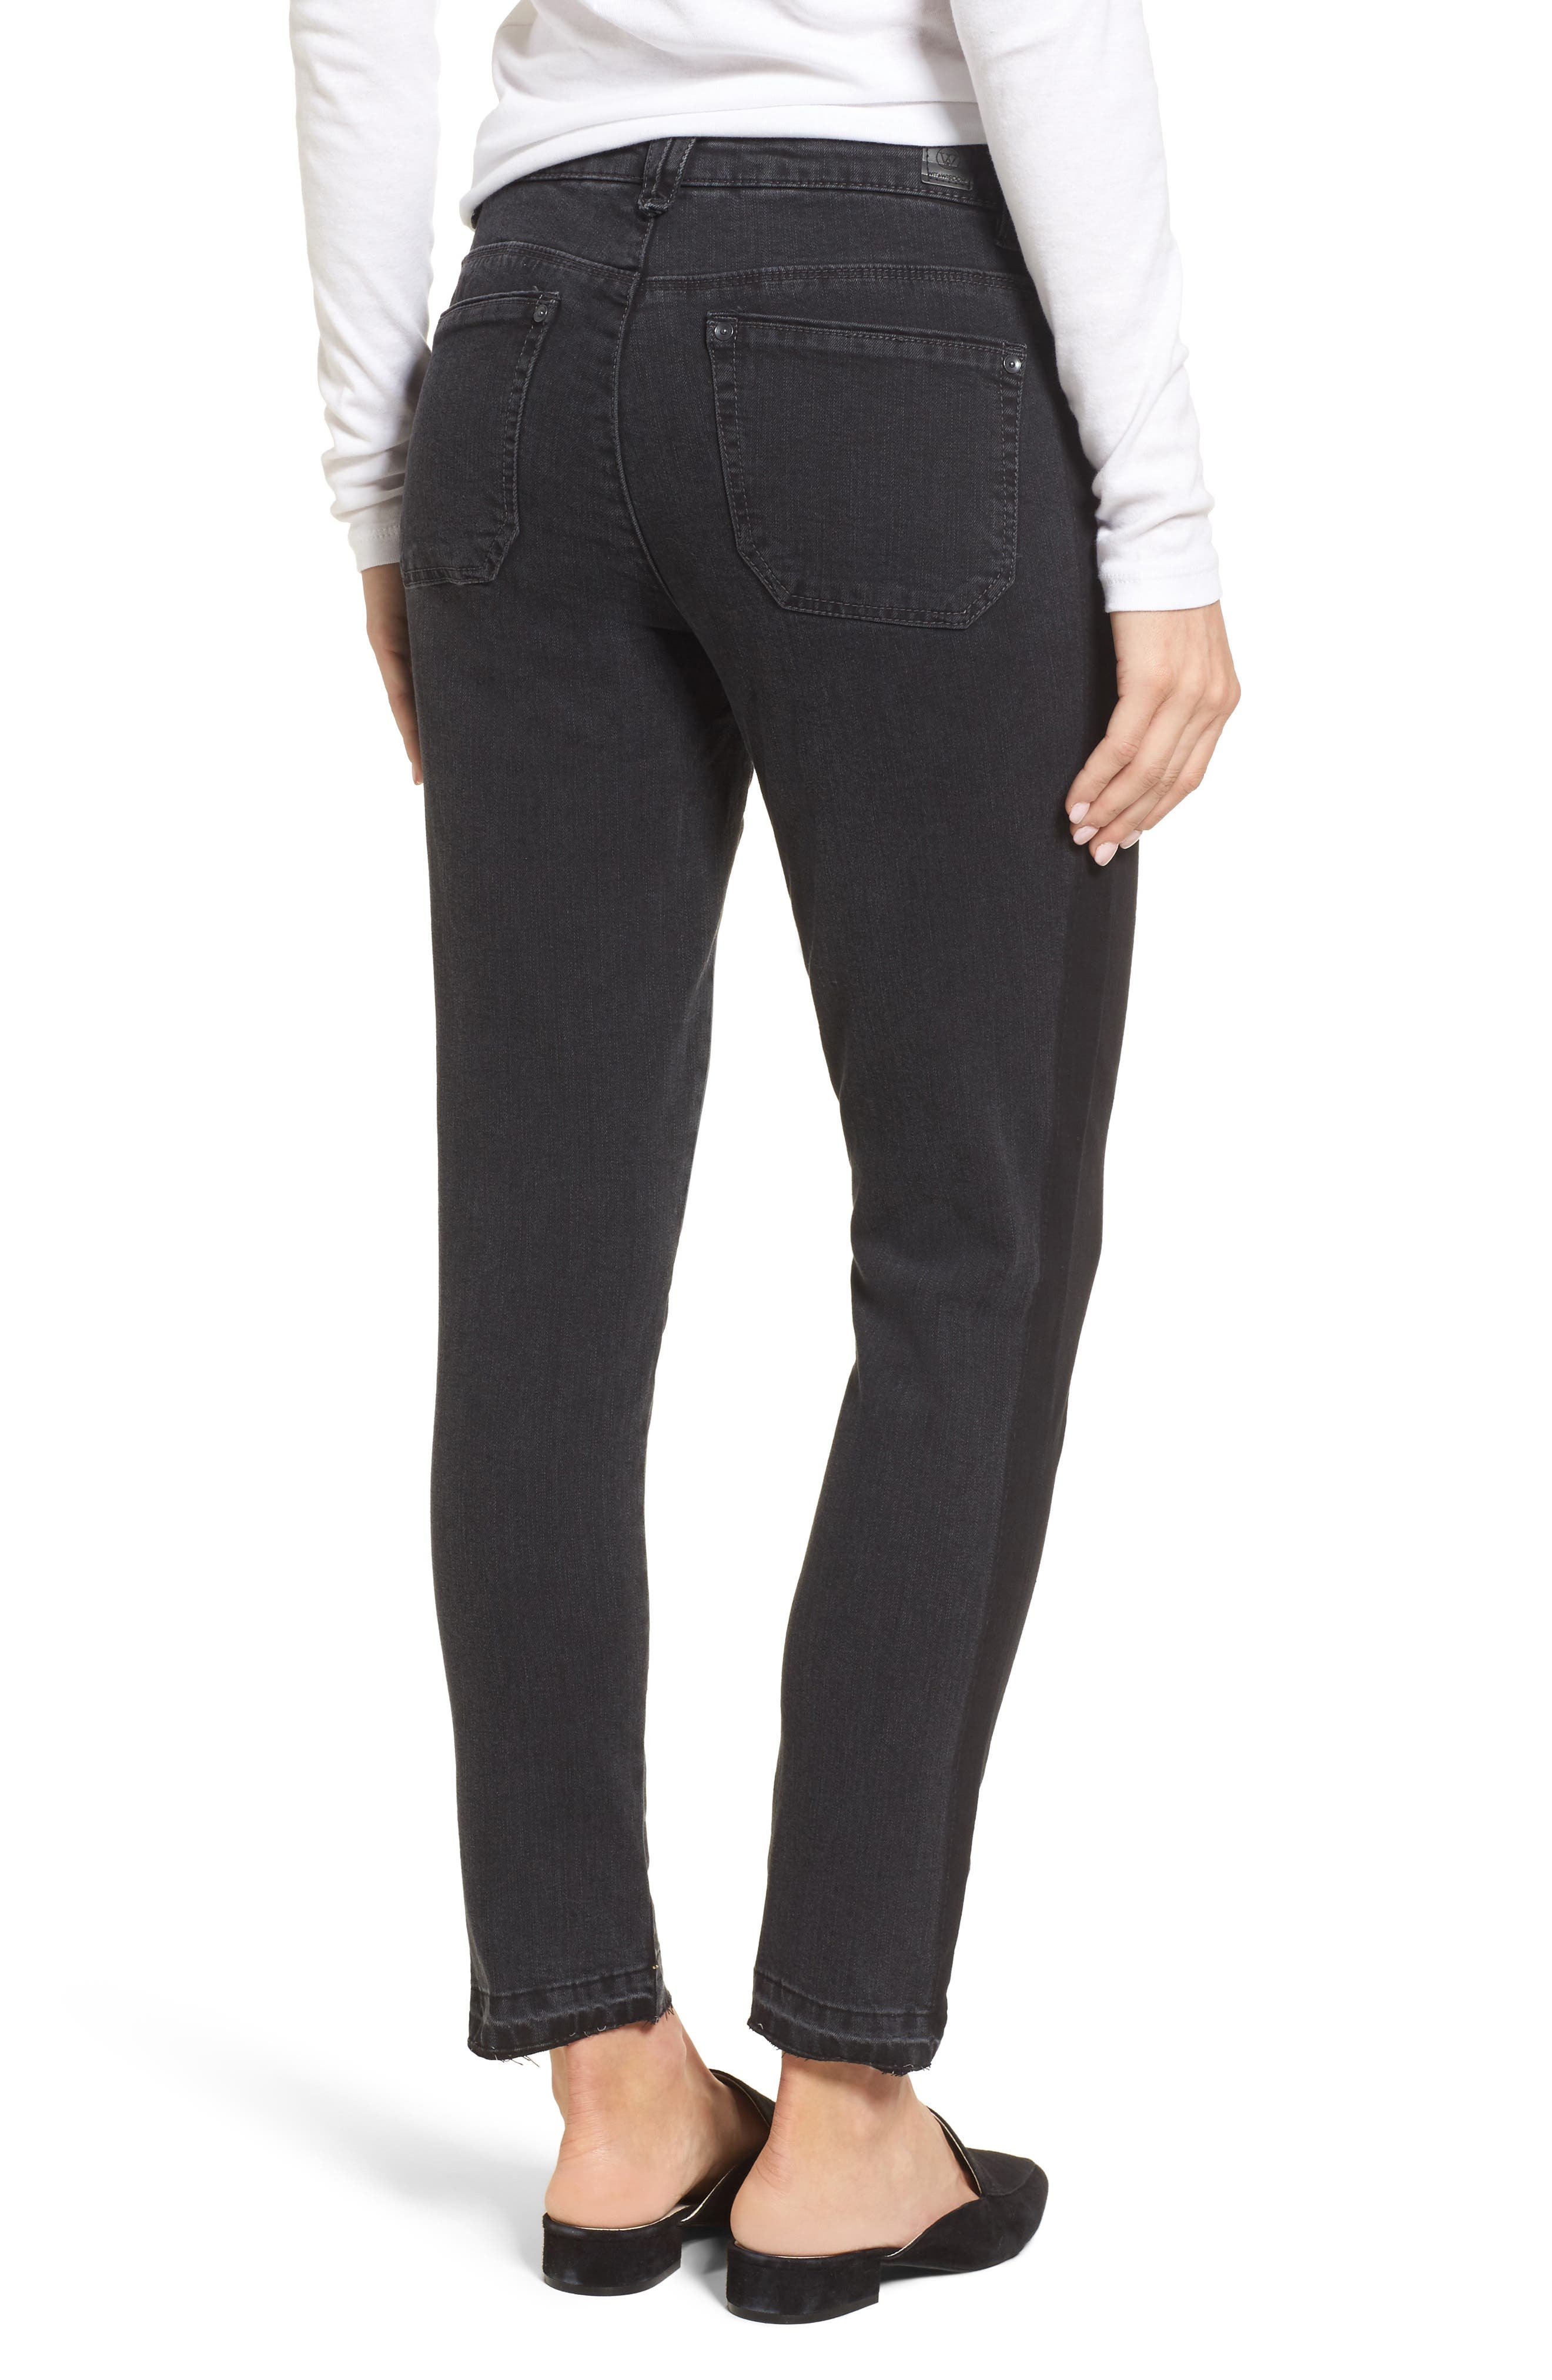 Alternate Image 2  - Wit & Wisdom Tuxedo Stripe Skinny Jeans (Nordstrom Exclusive) (Regular & Petite)